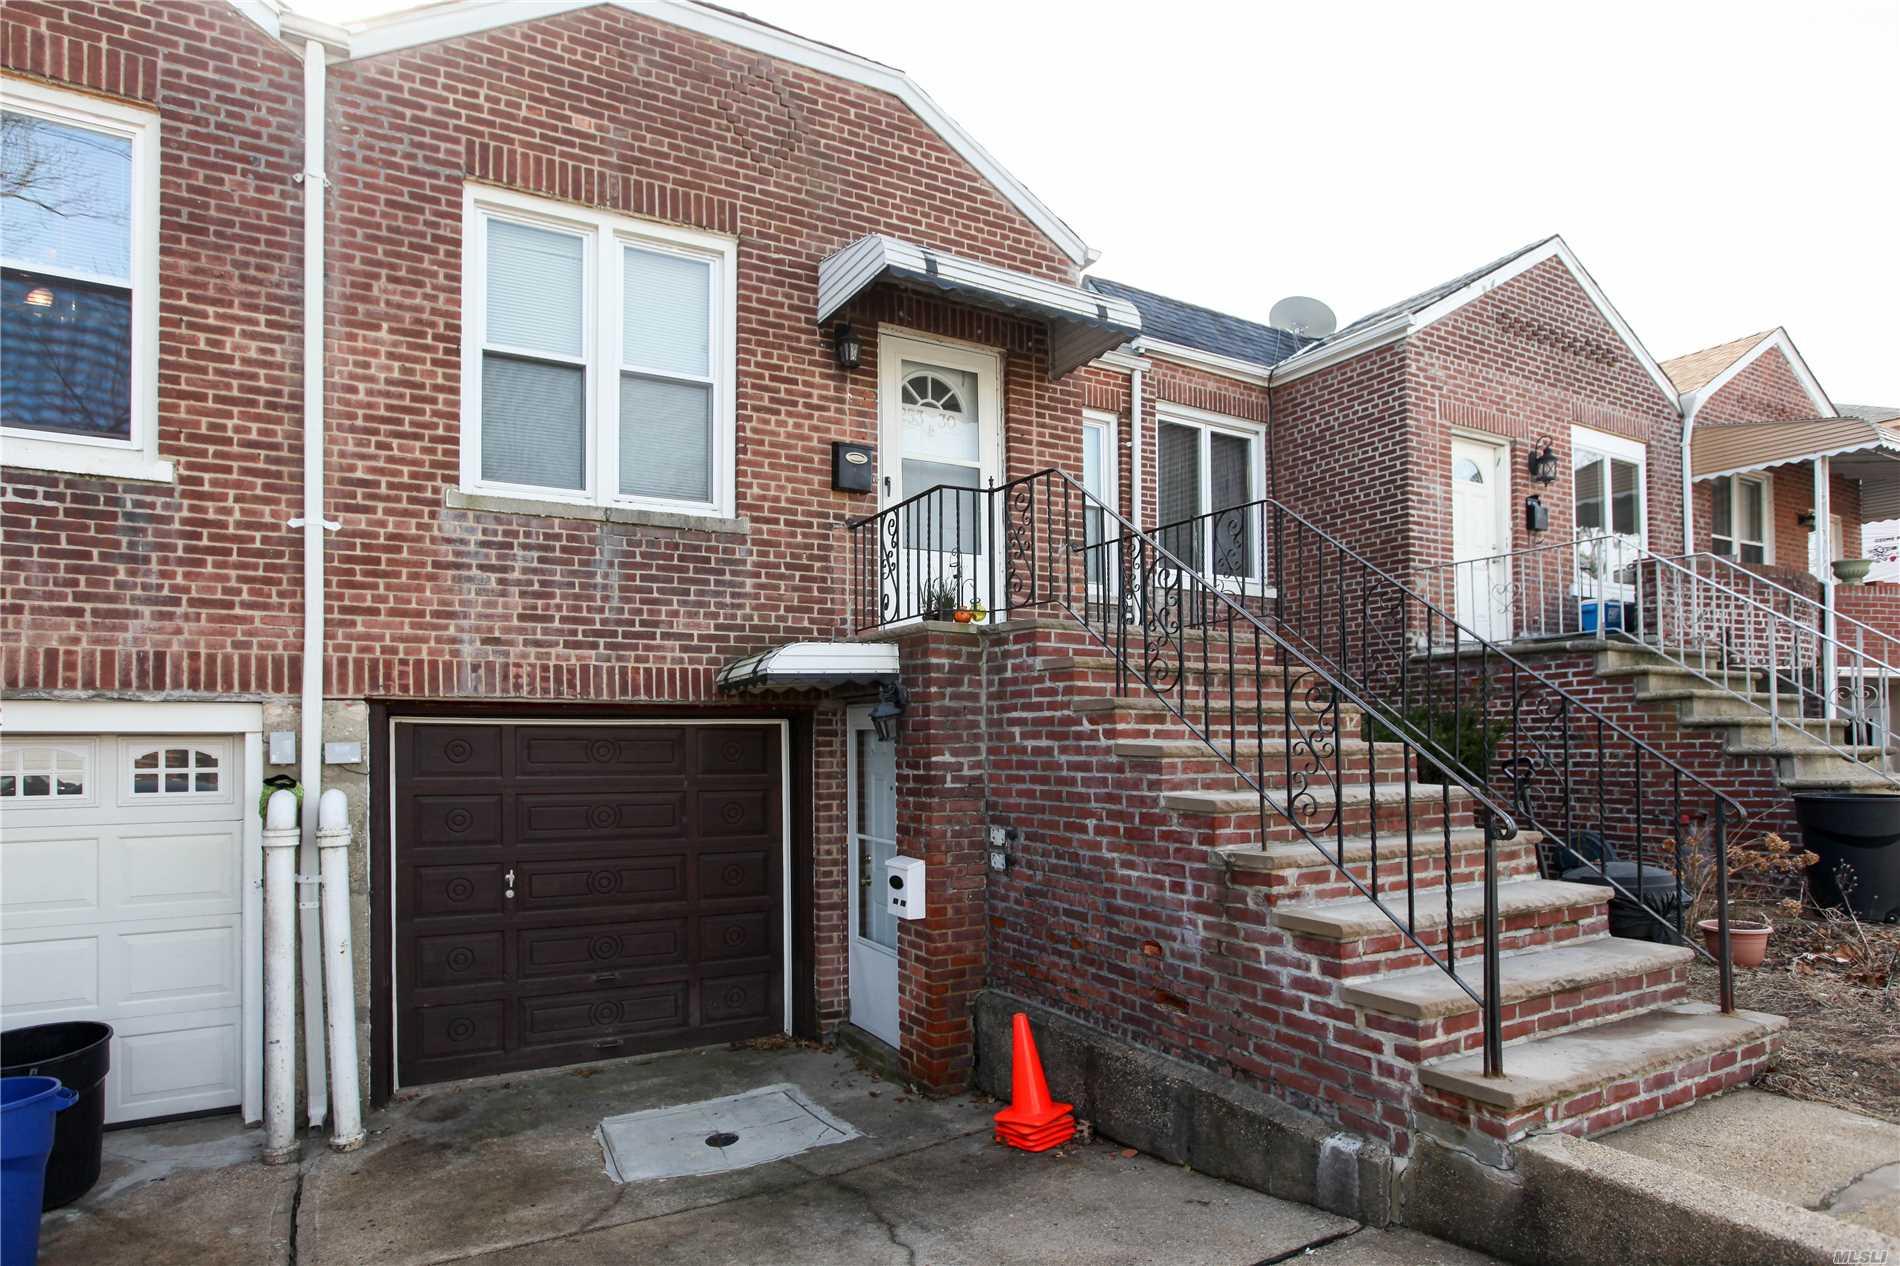 253-30 85th Rd - Bellerose, New York